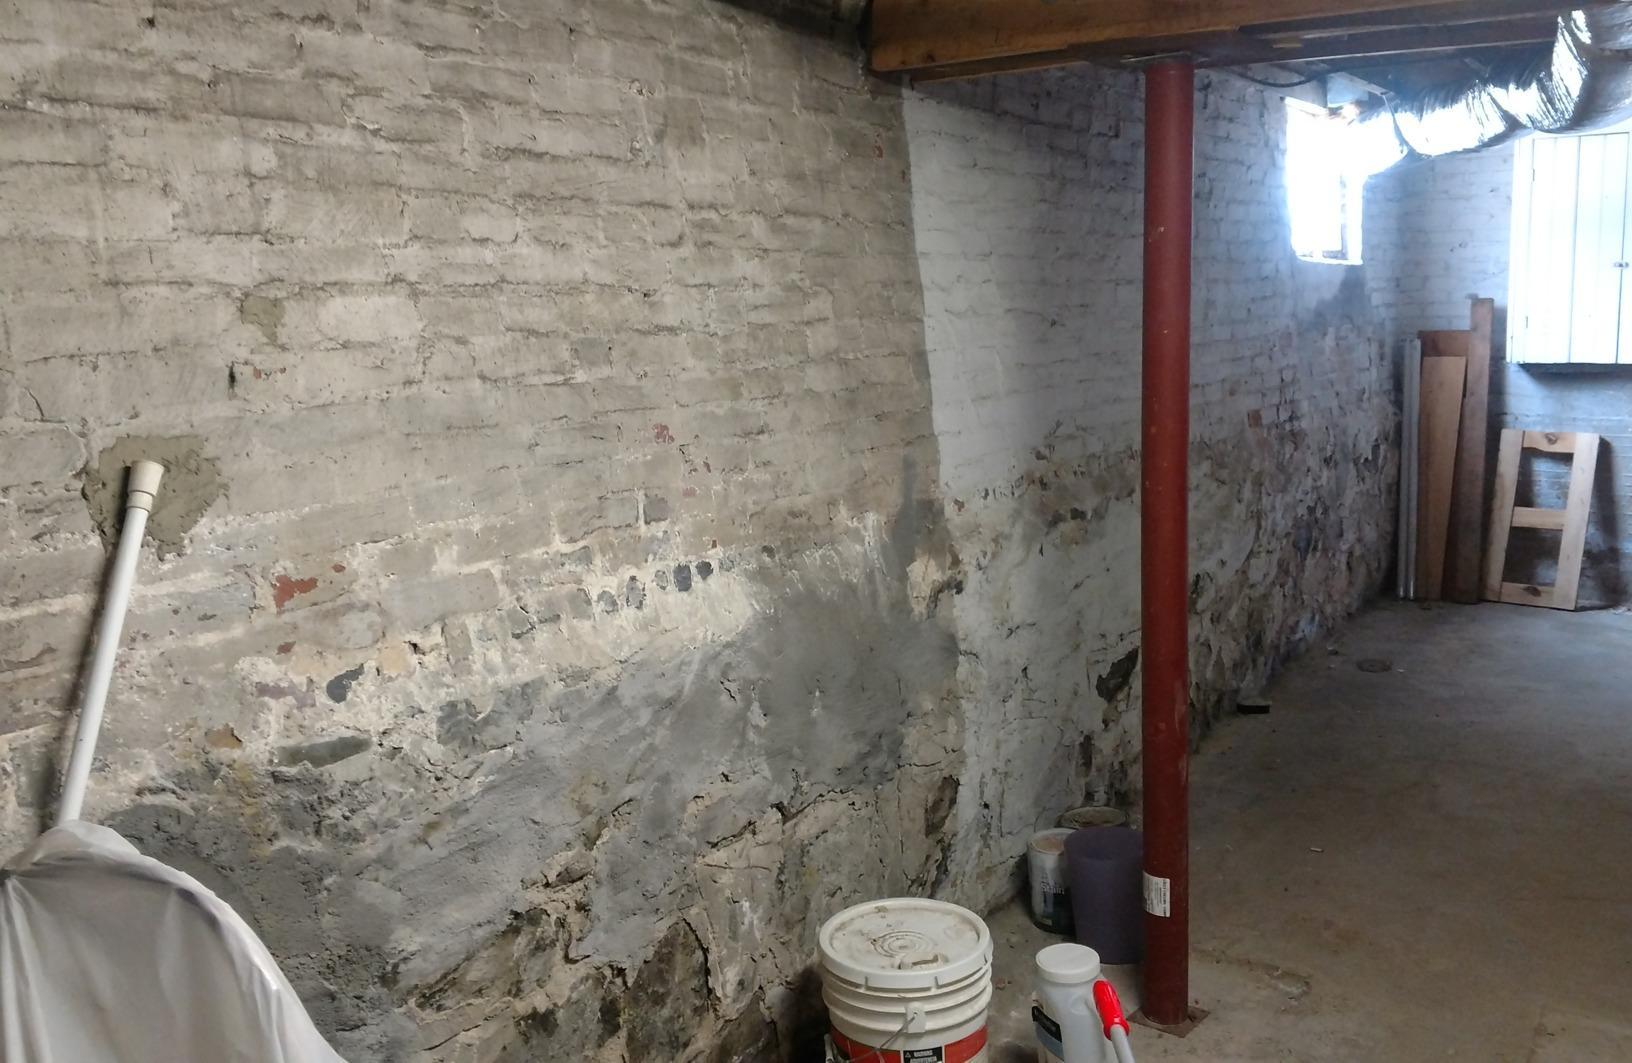 Medford, MA Bowing Wall Repair - Before Photo